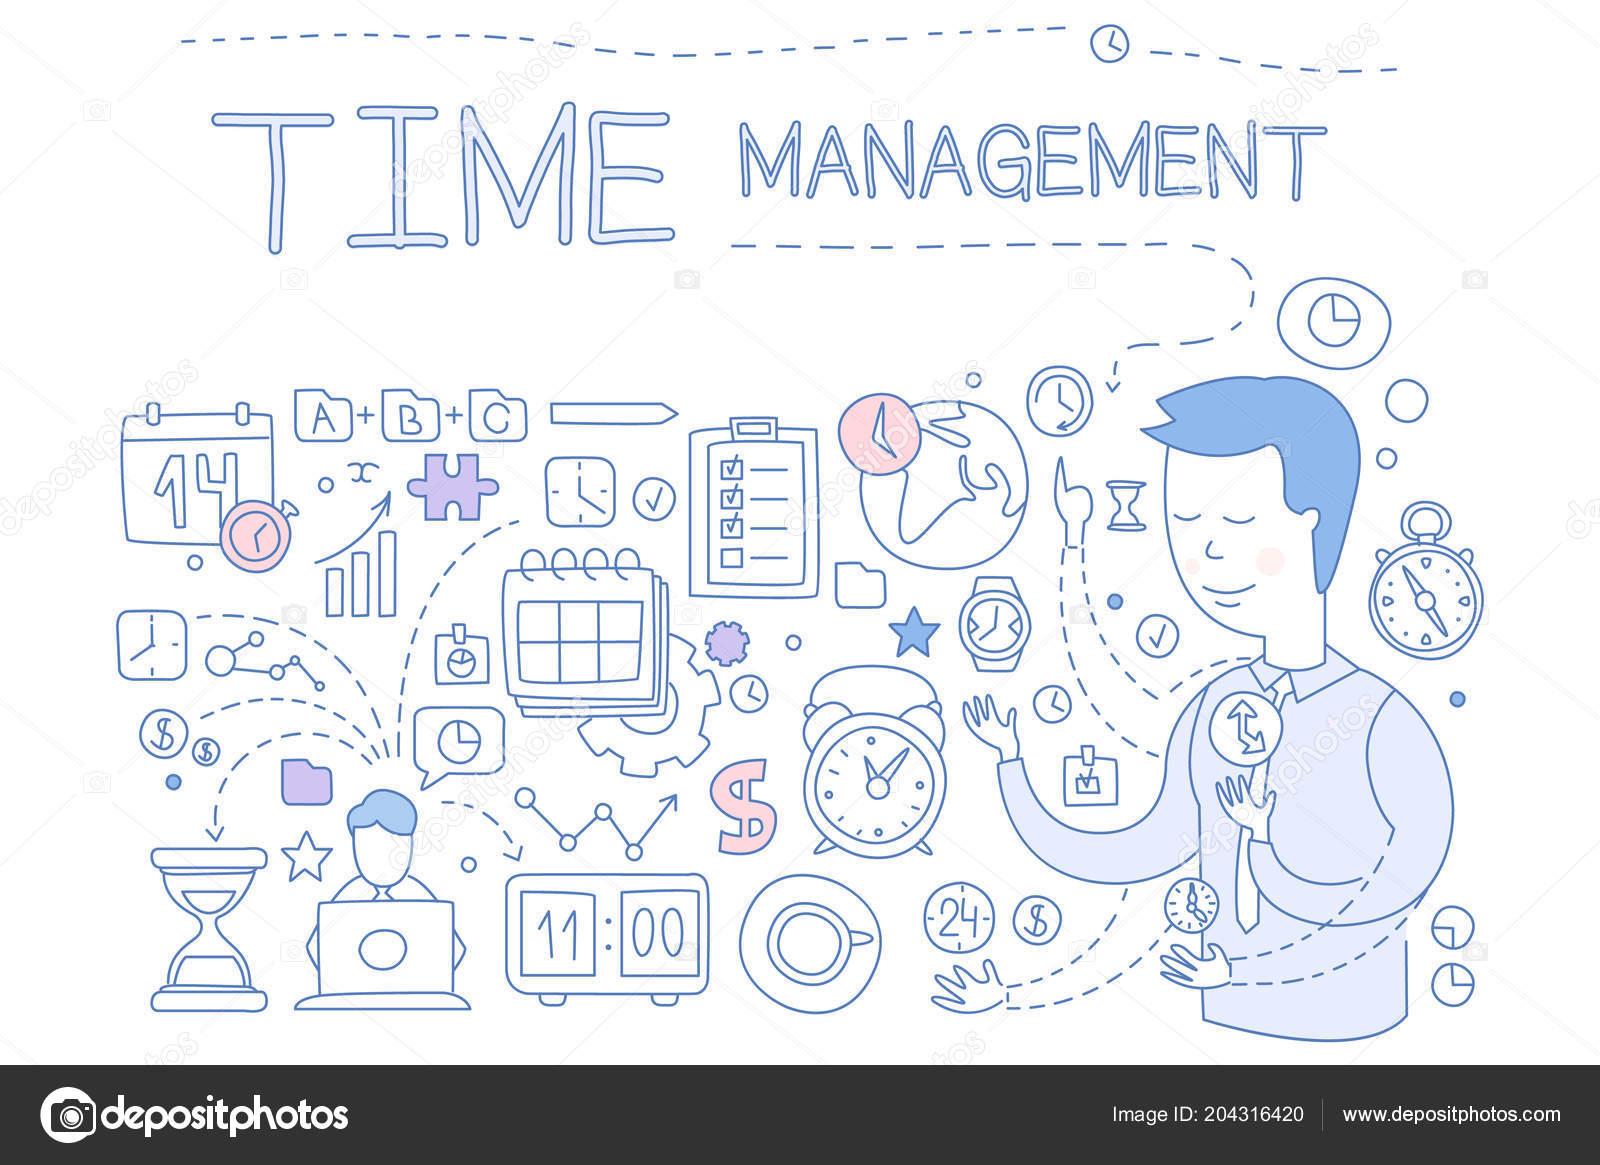 Time Management Set Hand Drawn Business Planning Design Elements For Banner Poster Brochure Flyer Advertising Vector Illustration Stock Vector C Topvectors 204316420